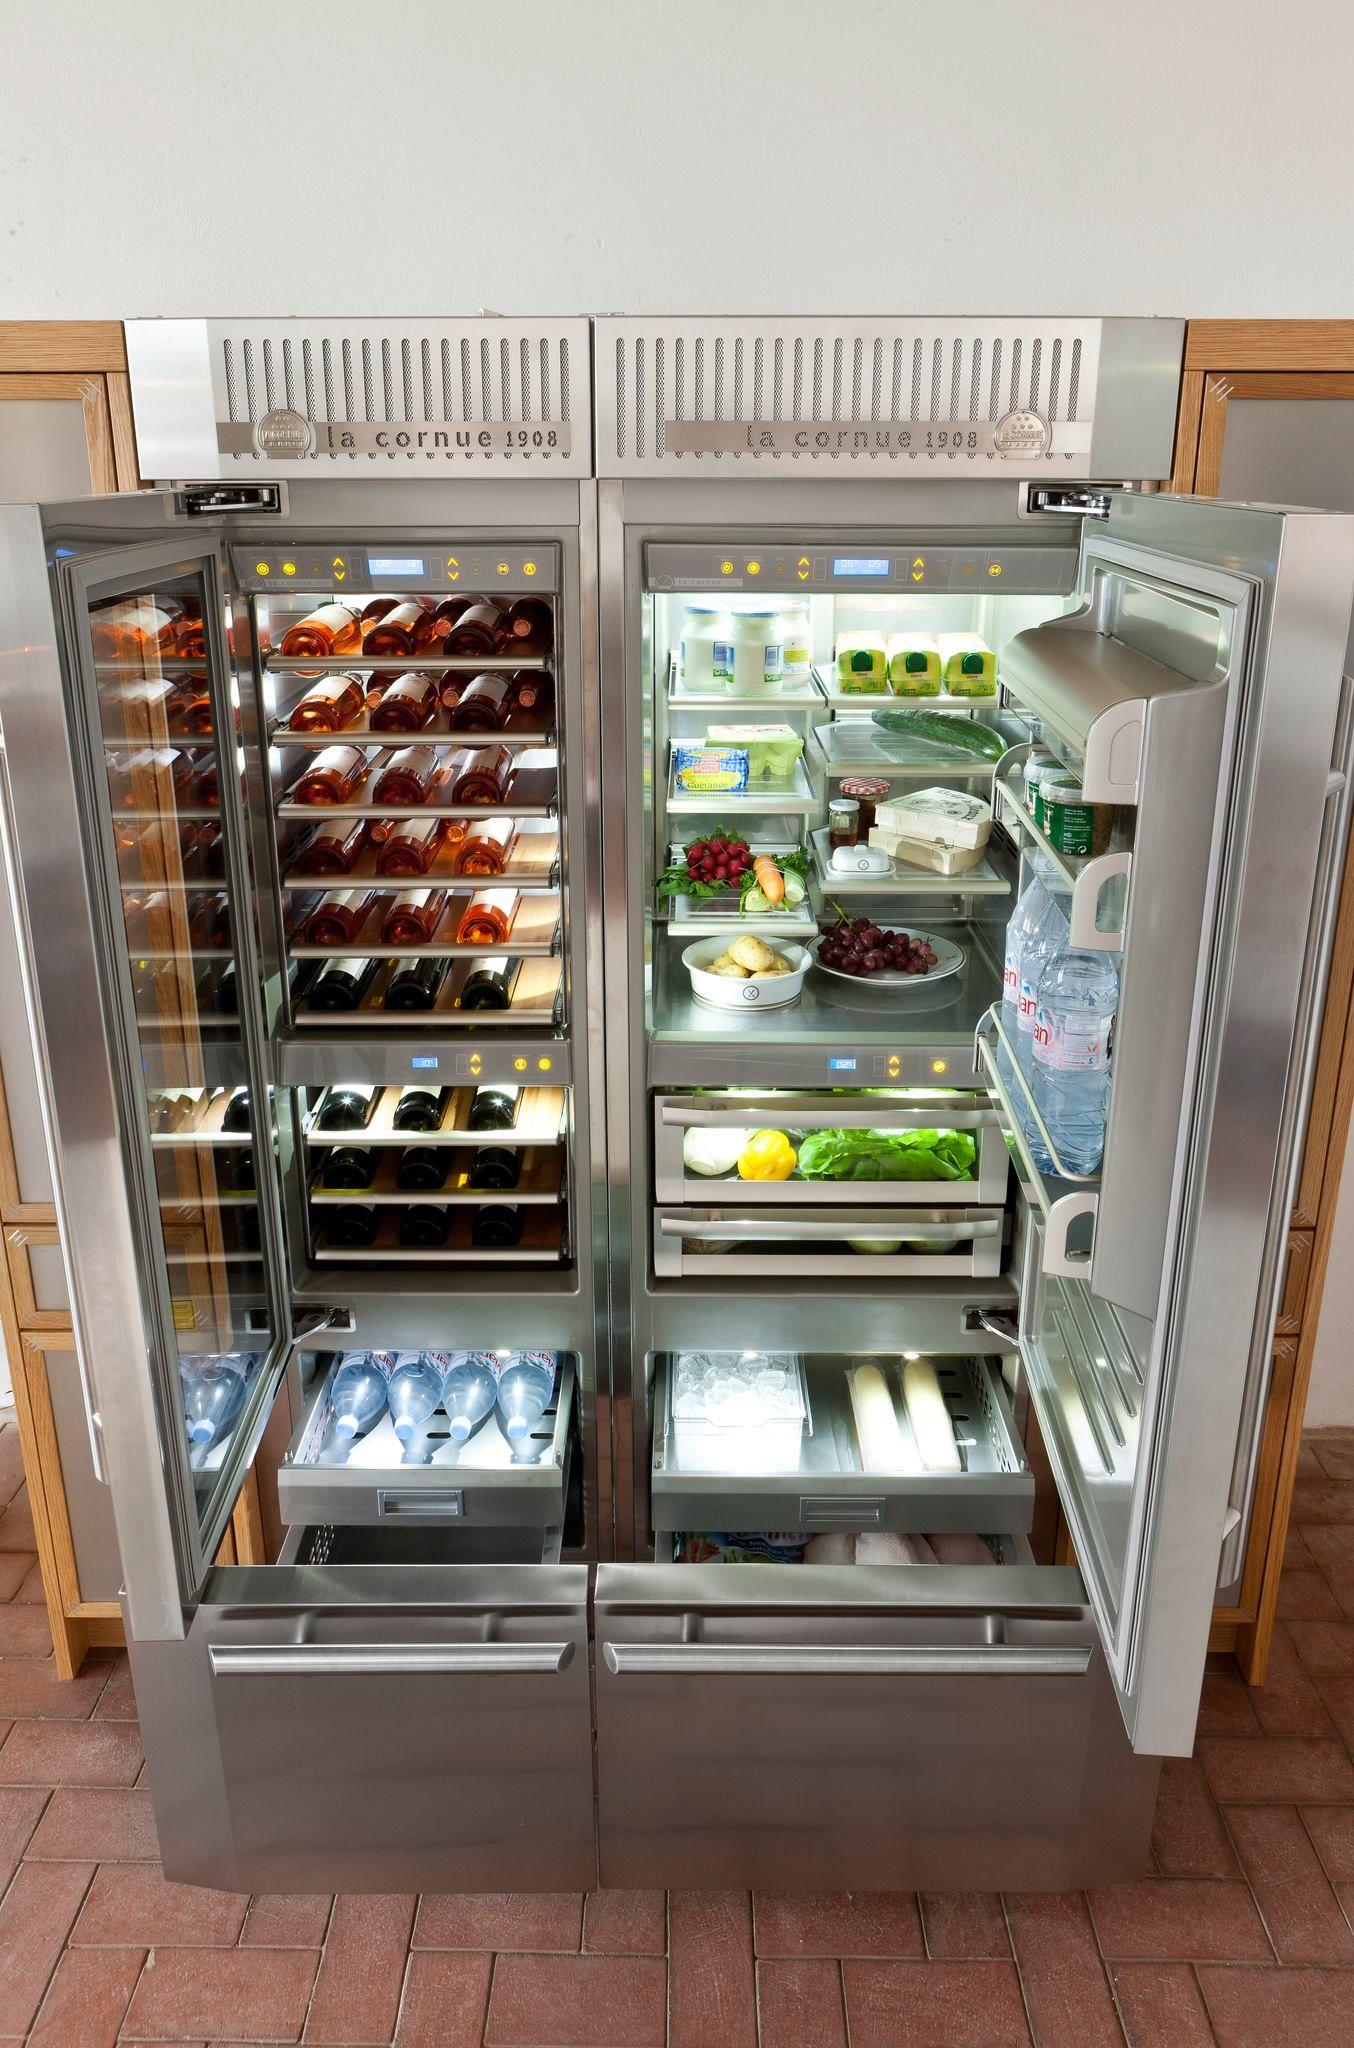 La Cornue refrigerator and wine cellar are made with the finest